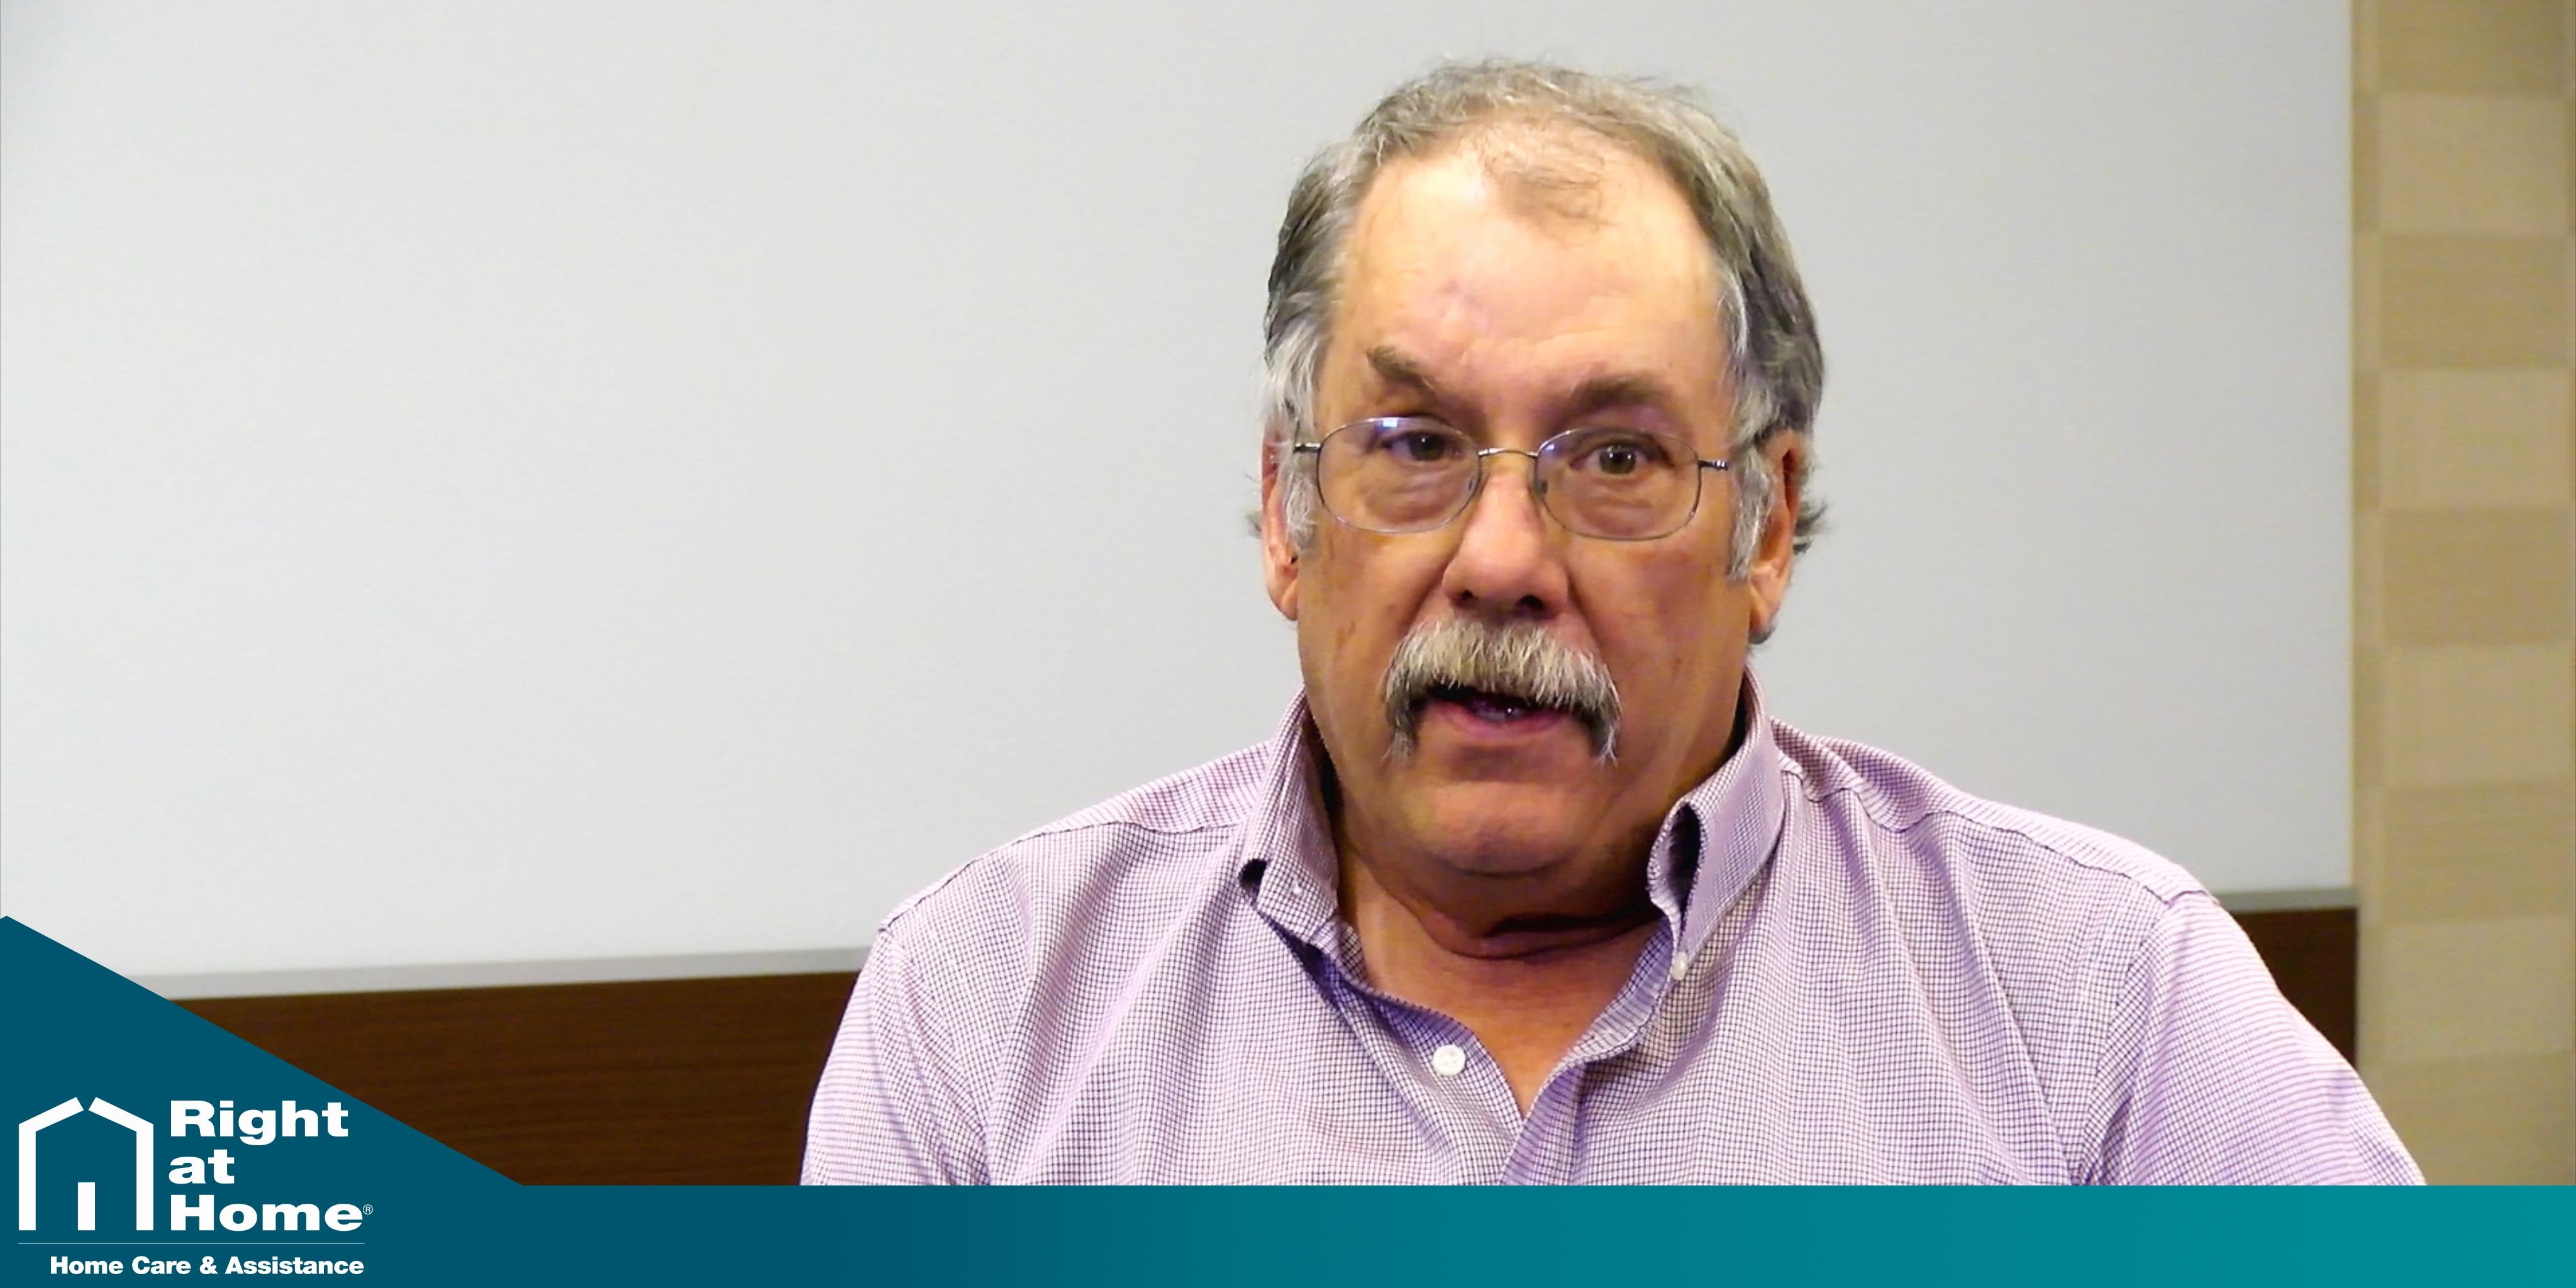 Mosman, Ed | Franchisee Testimonial